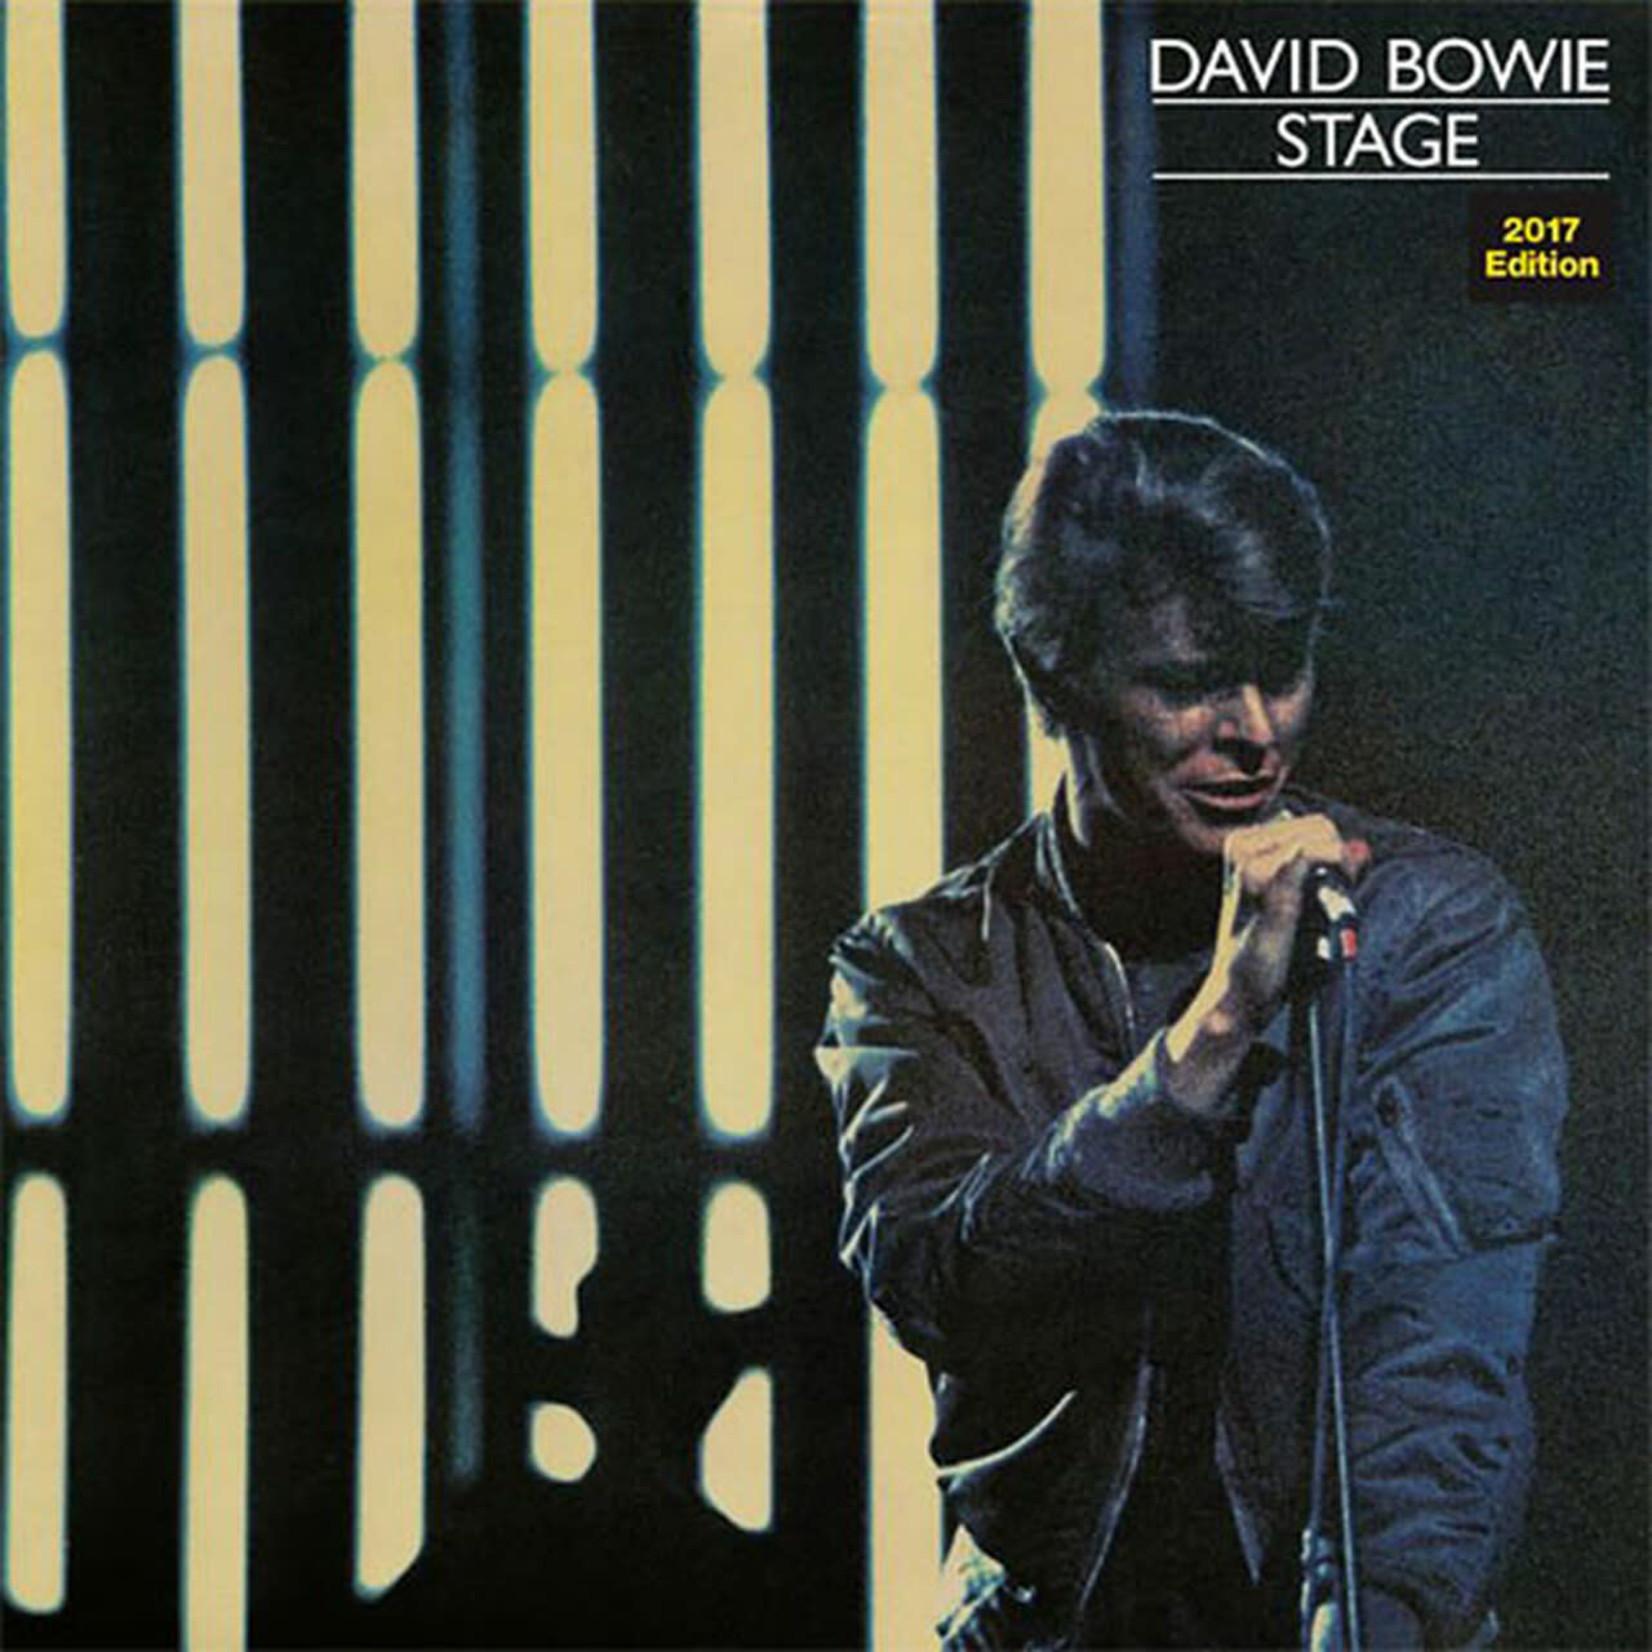 [New] Bowie, David: Stage (3LP)